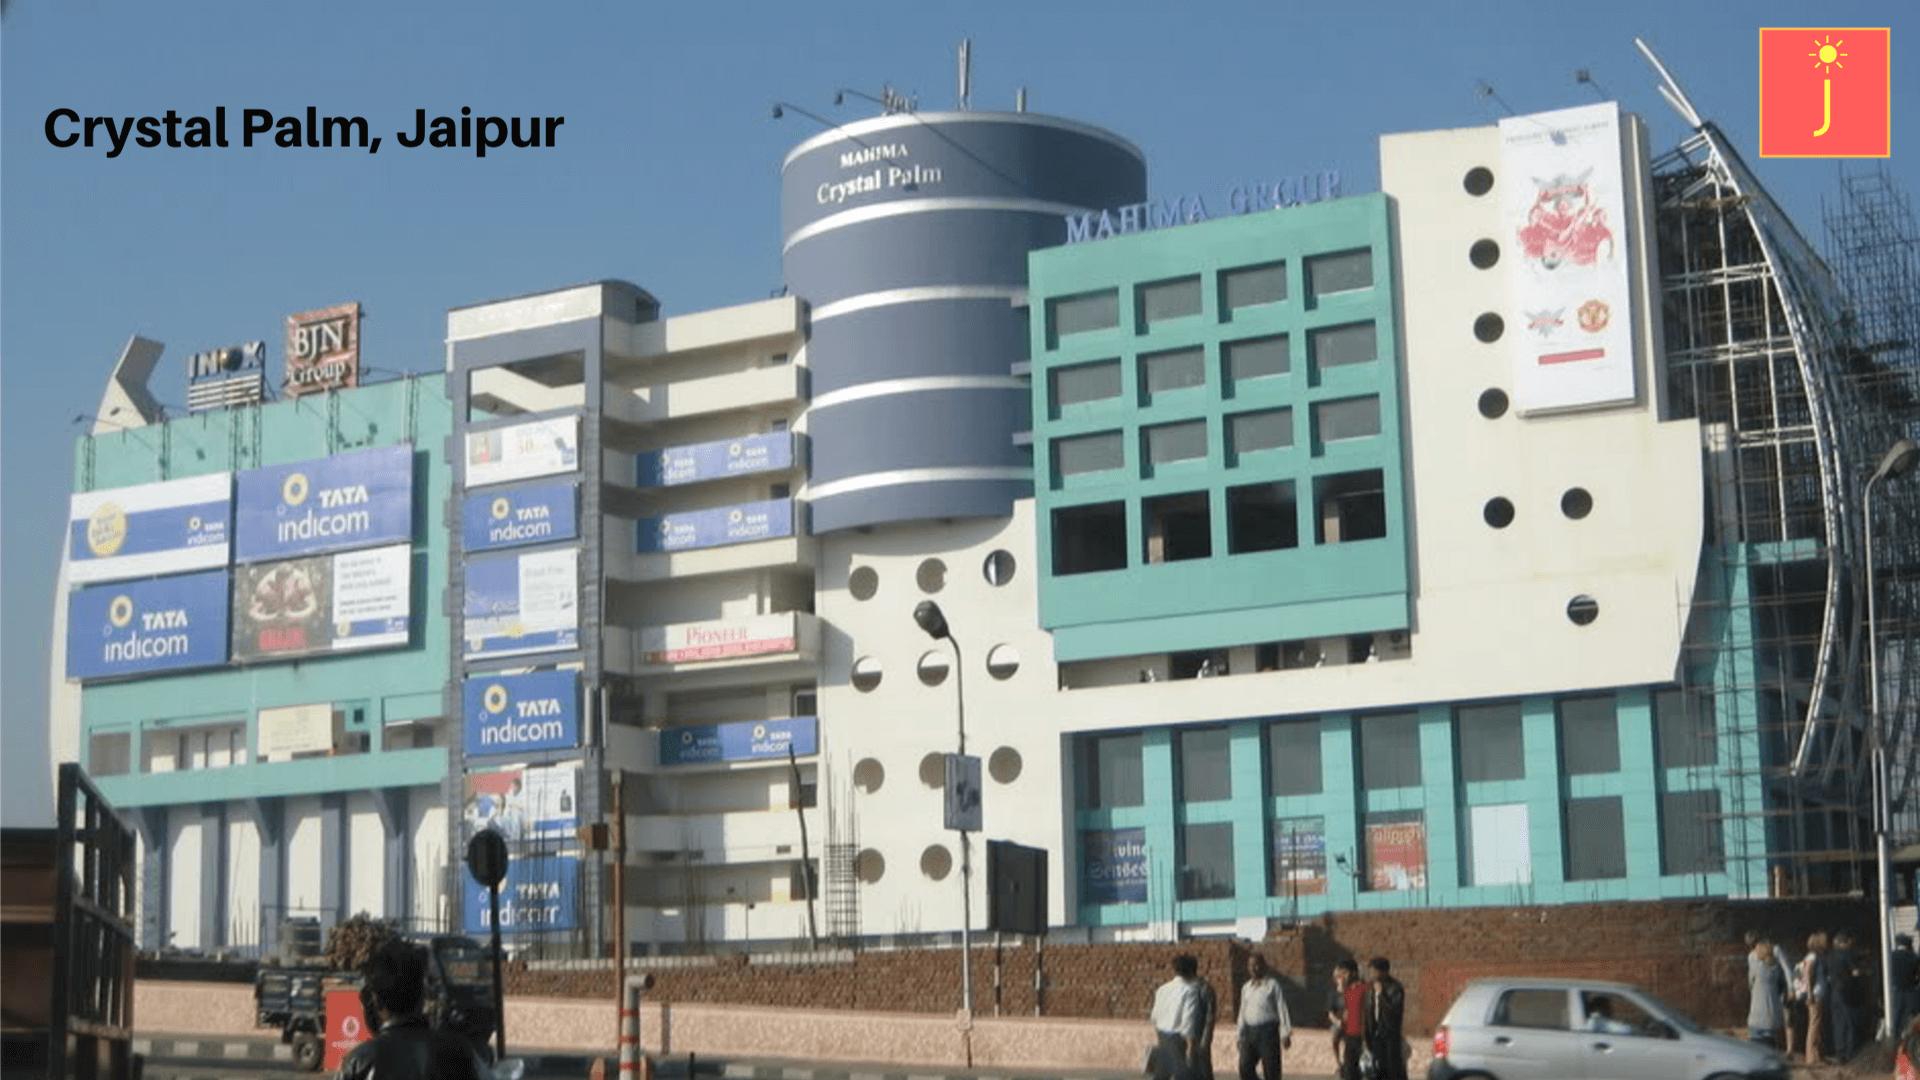 مرکز-خرید-کریستال-پالم-جیپور